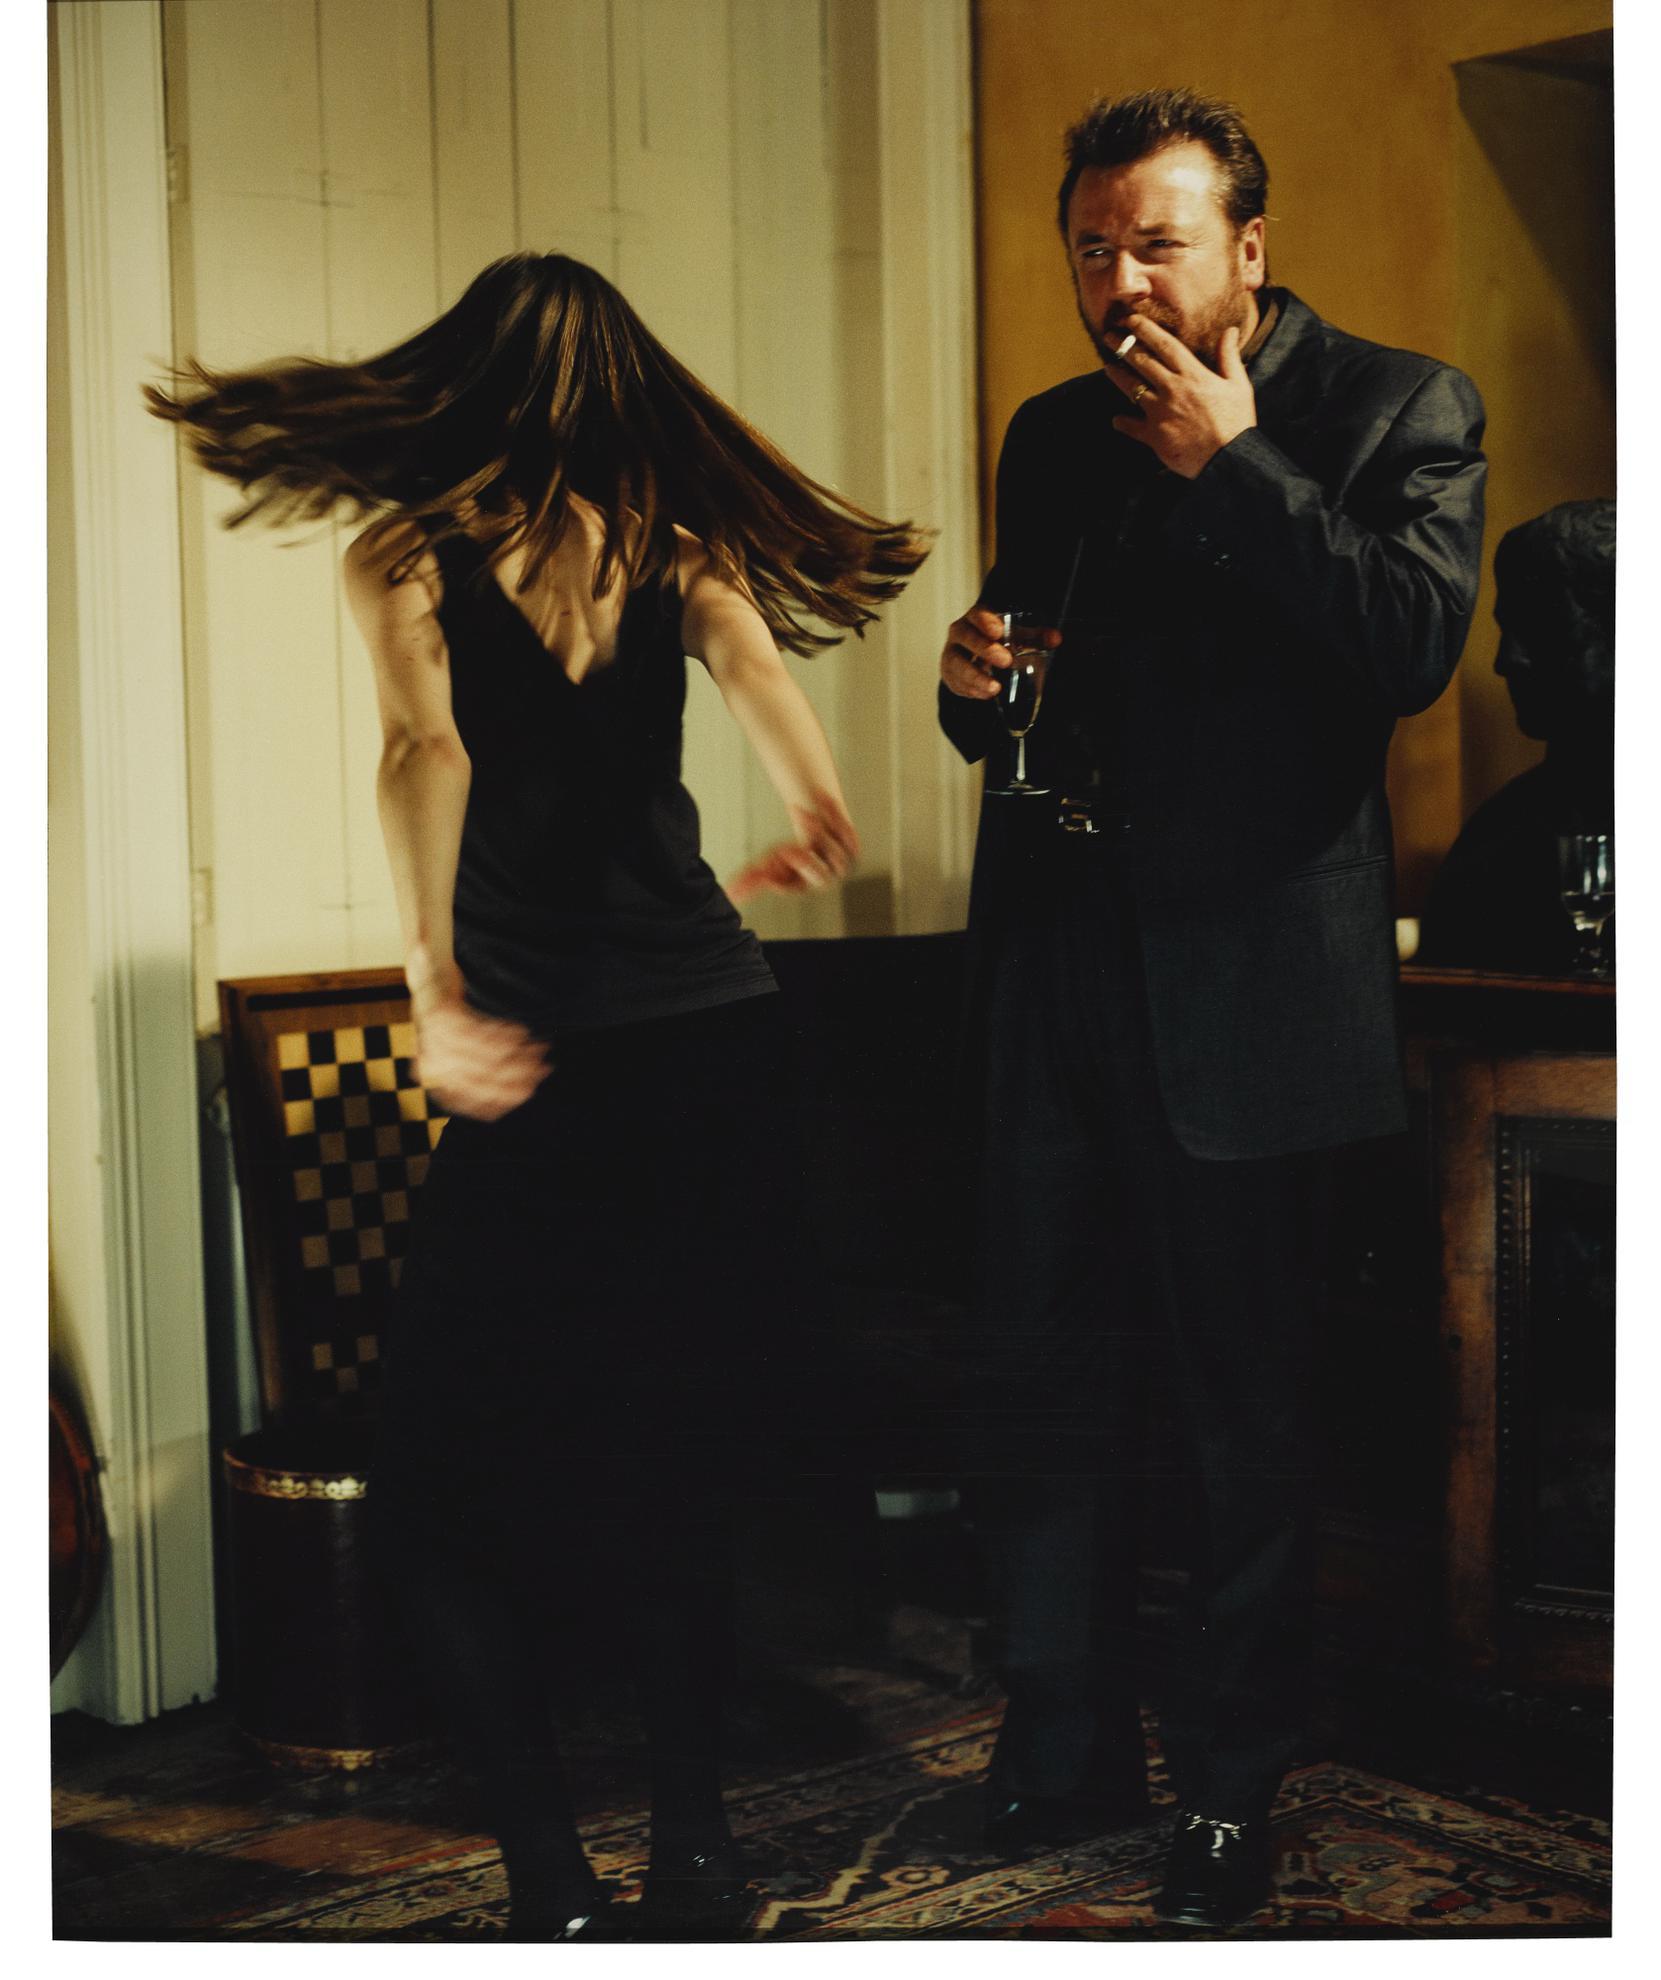 Sam Taylor-Johnson-Third Party - Ray & Pauline-2000